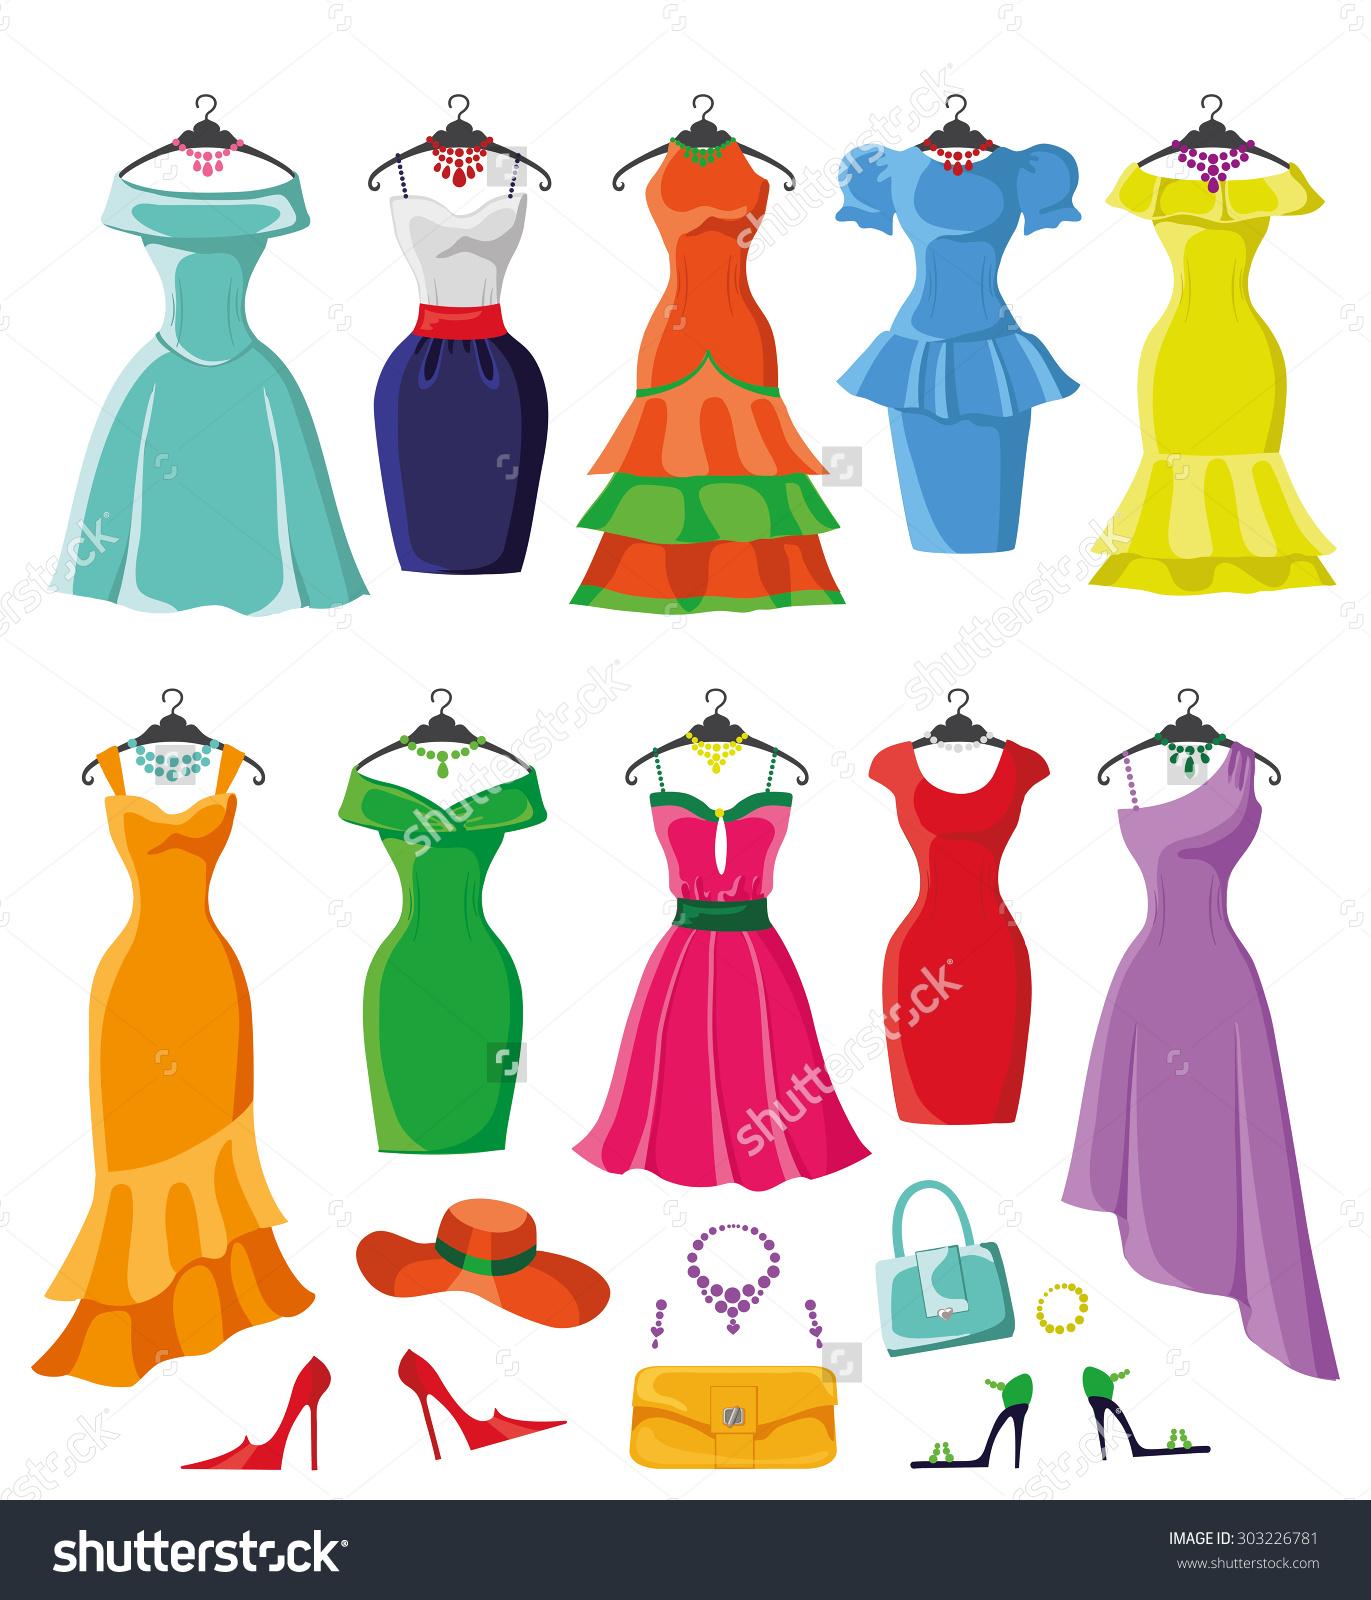 Elegant dresses clipart.